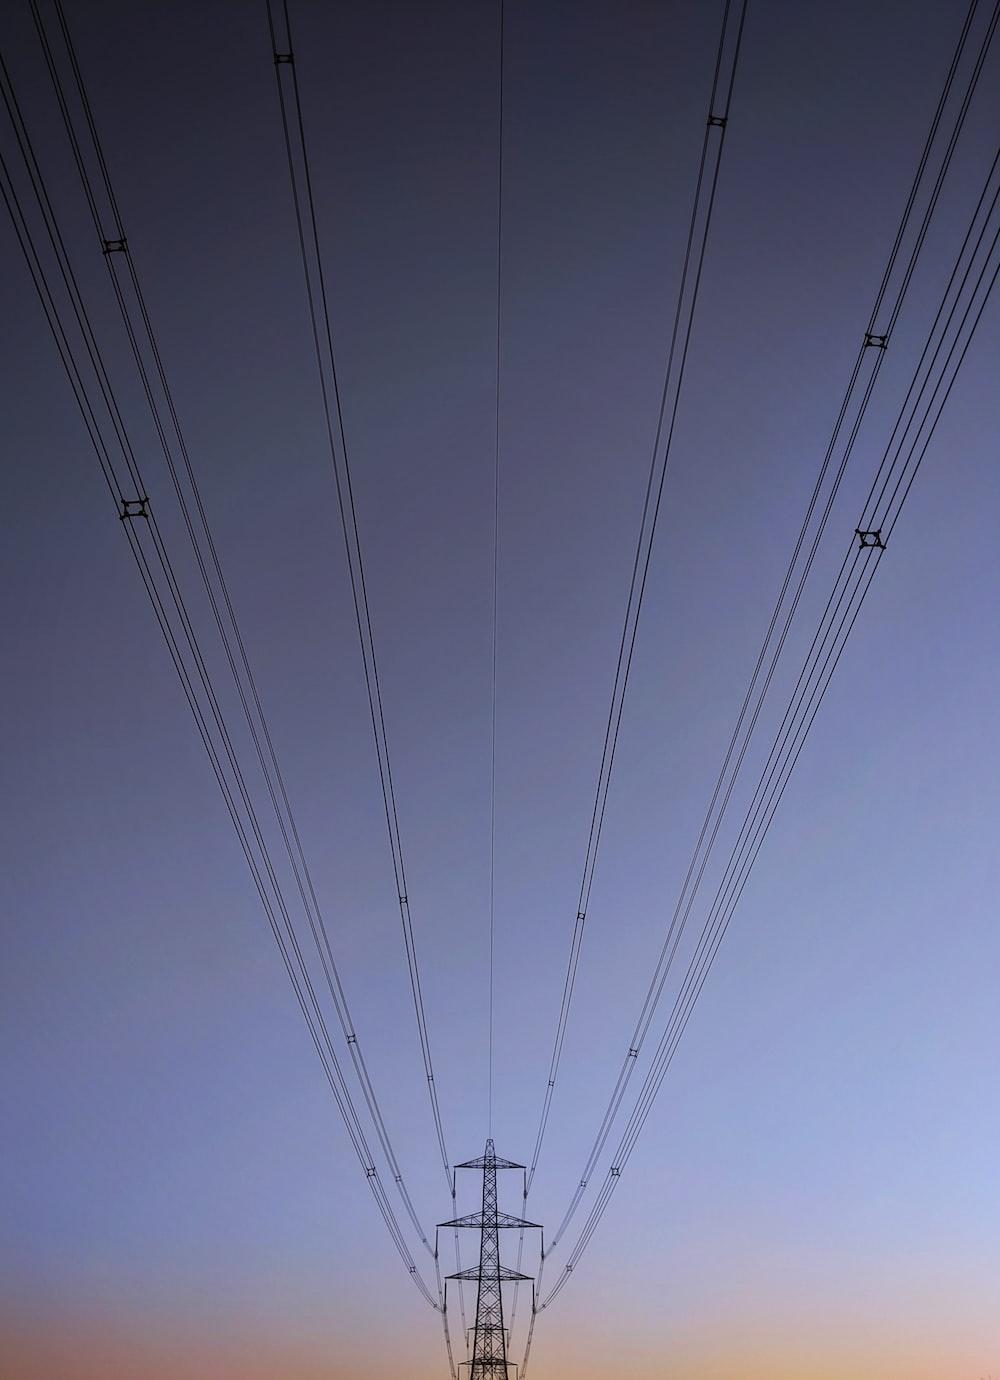 black electric wires under blue sky